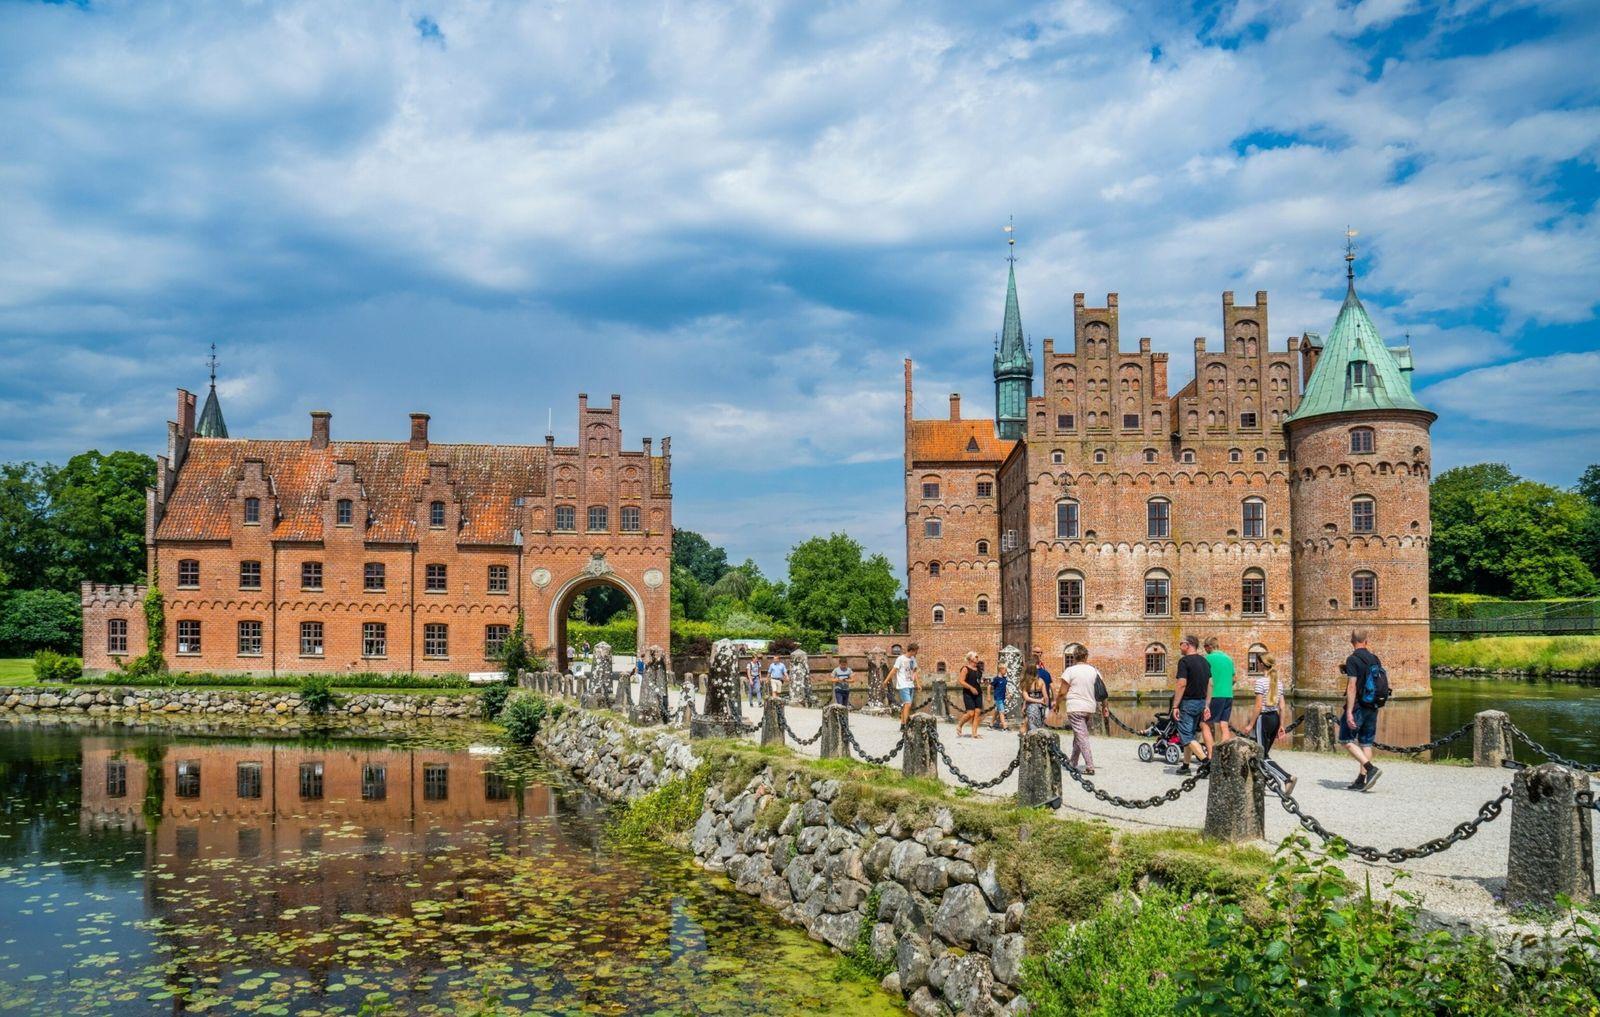 Denmark, Funen, Egeskov Slot, view of the 16th century Renaissance water castle